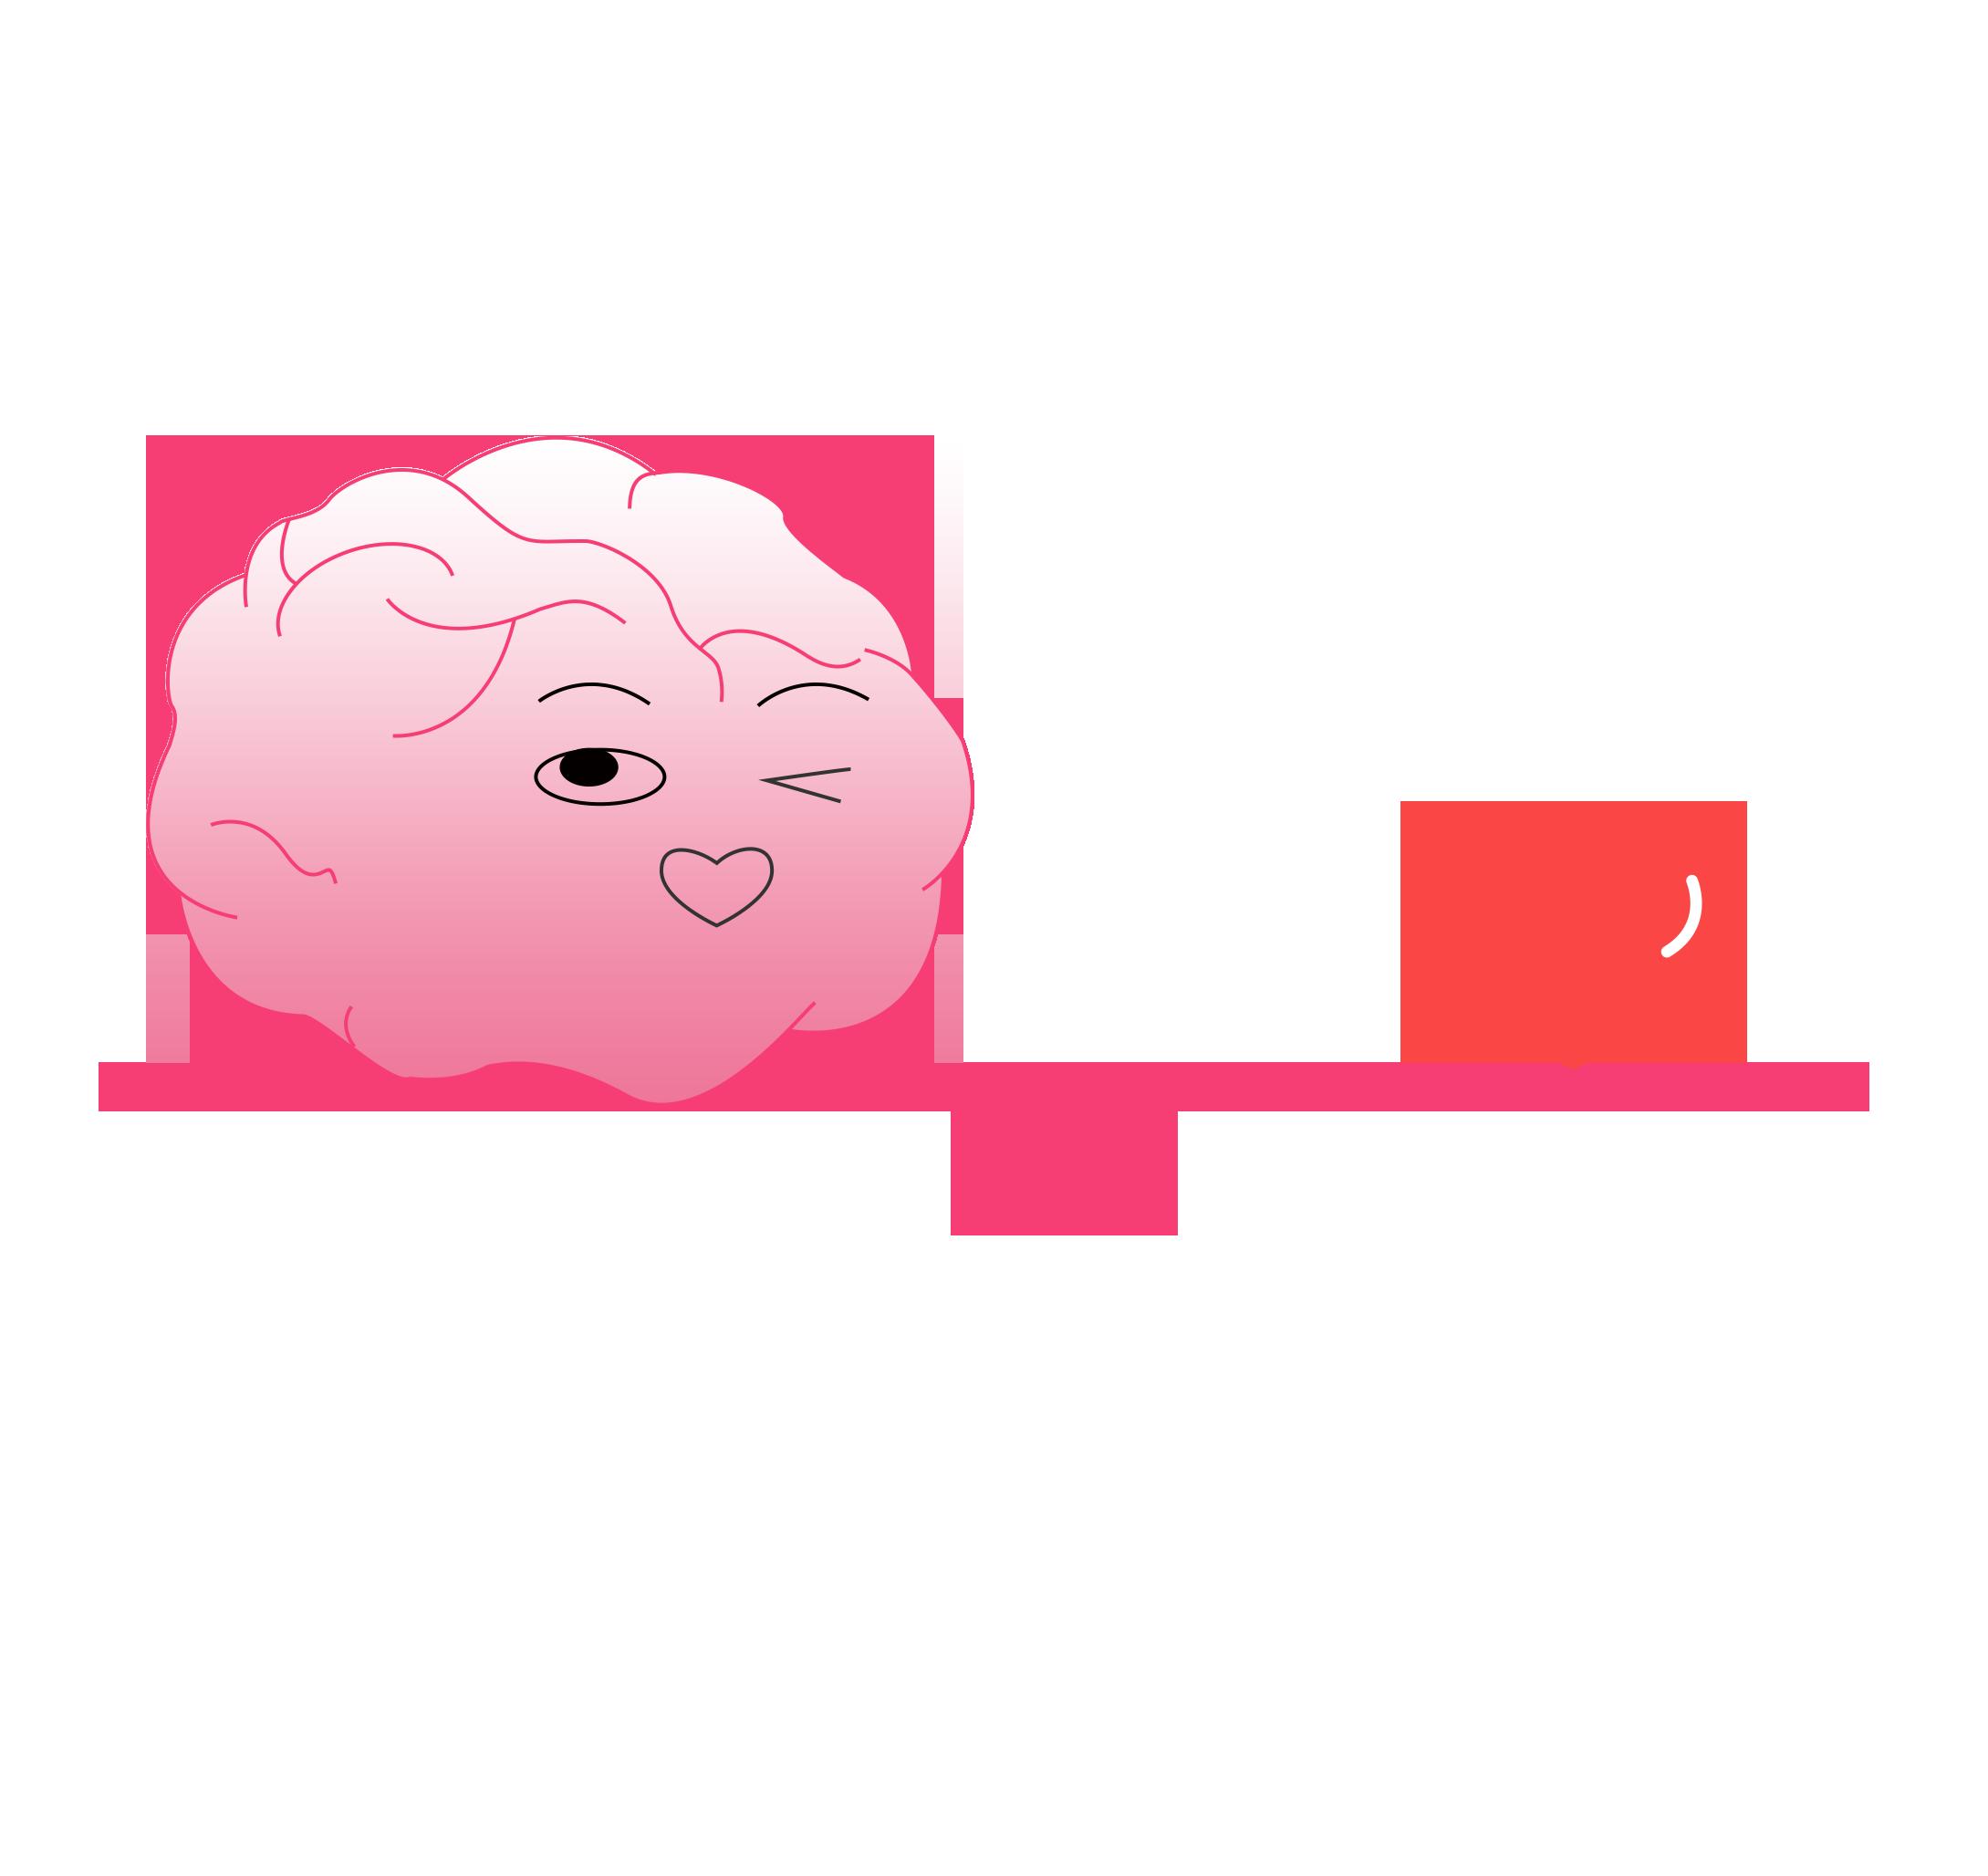 脑洞大师-Emoji样式贼多 messages sticker-0